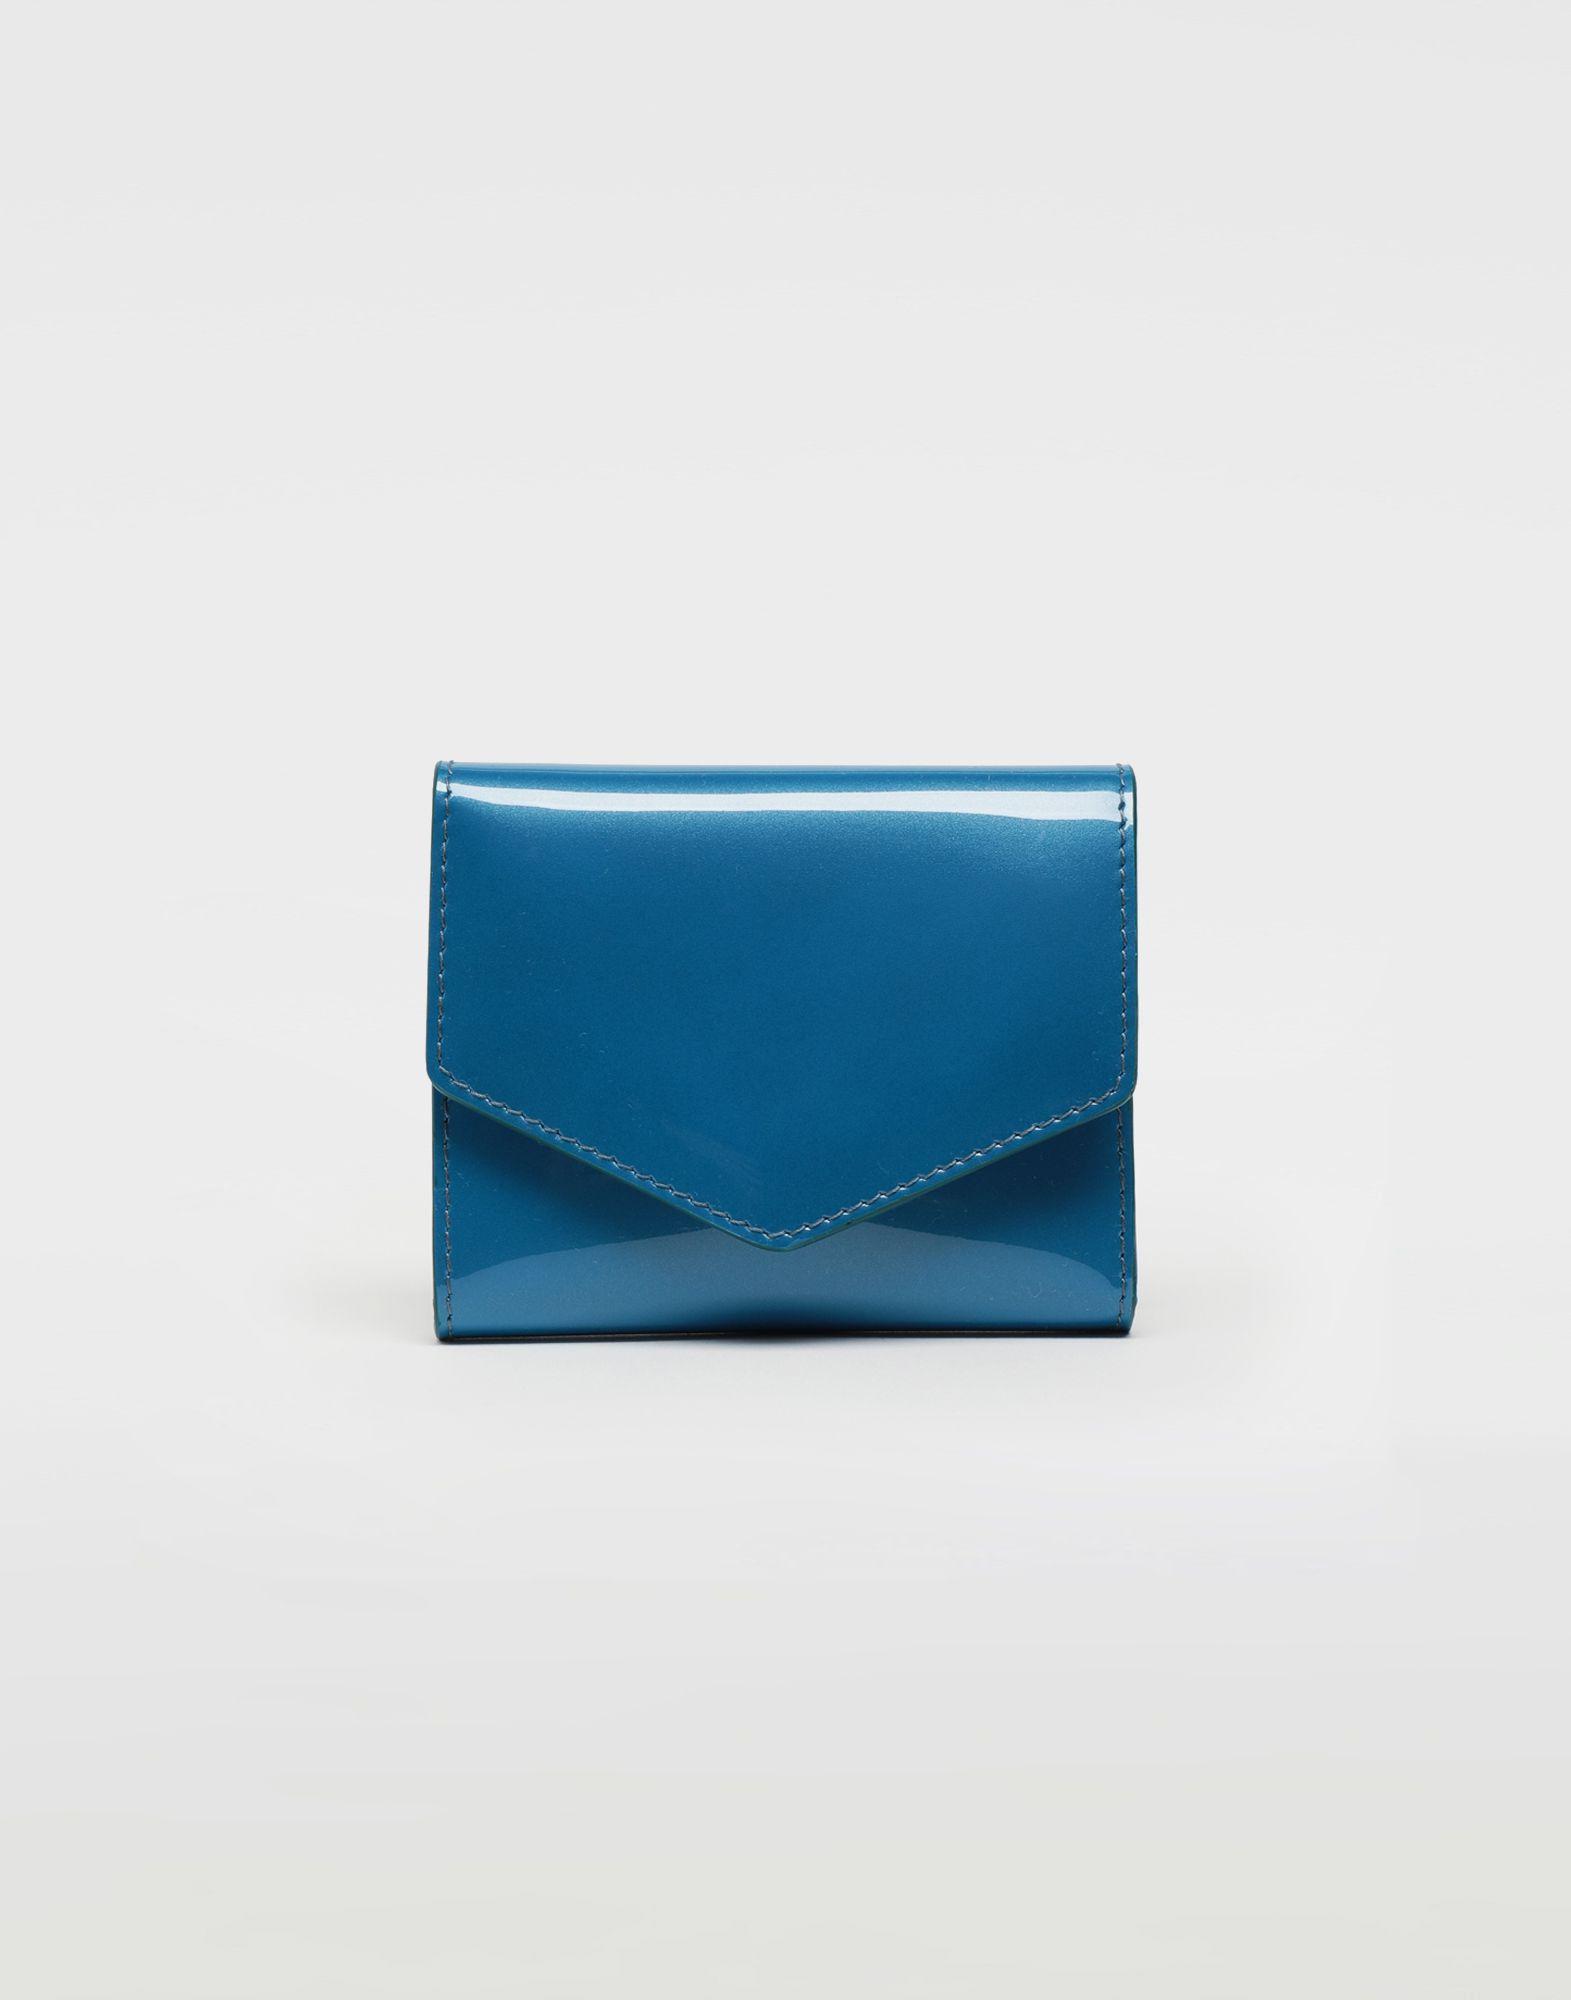 MAISON MARGIELA Patent leather wallet Wallet Woman f